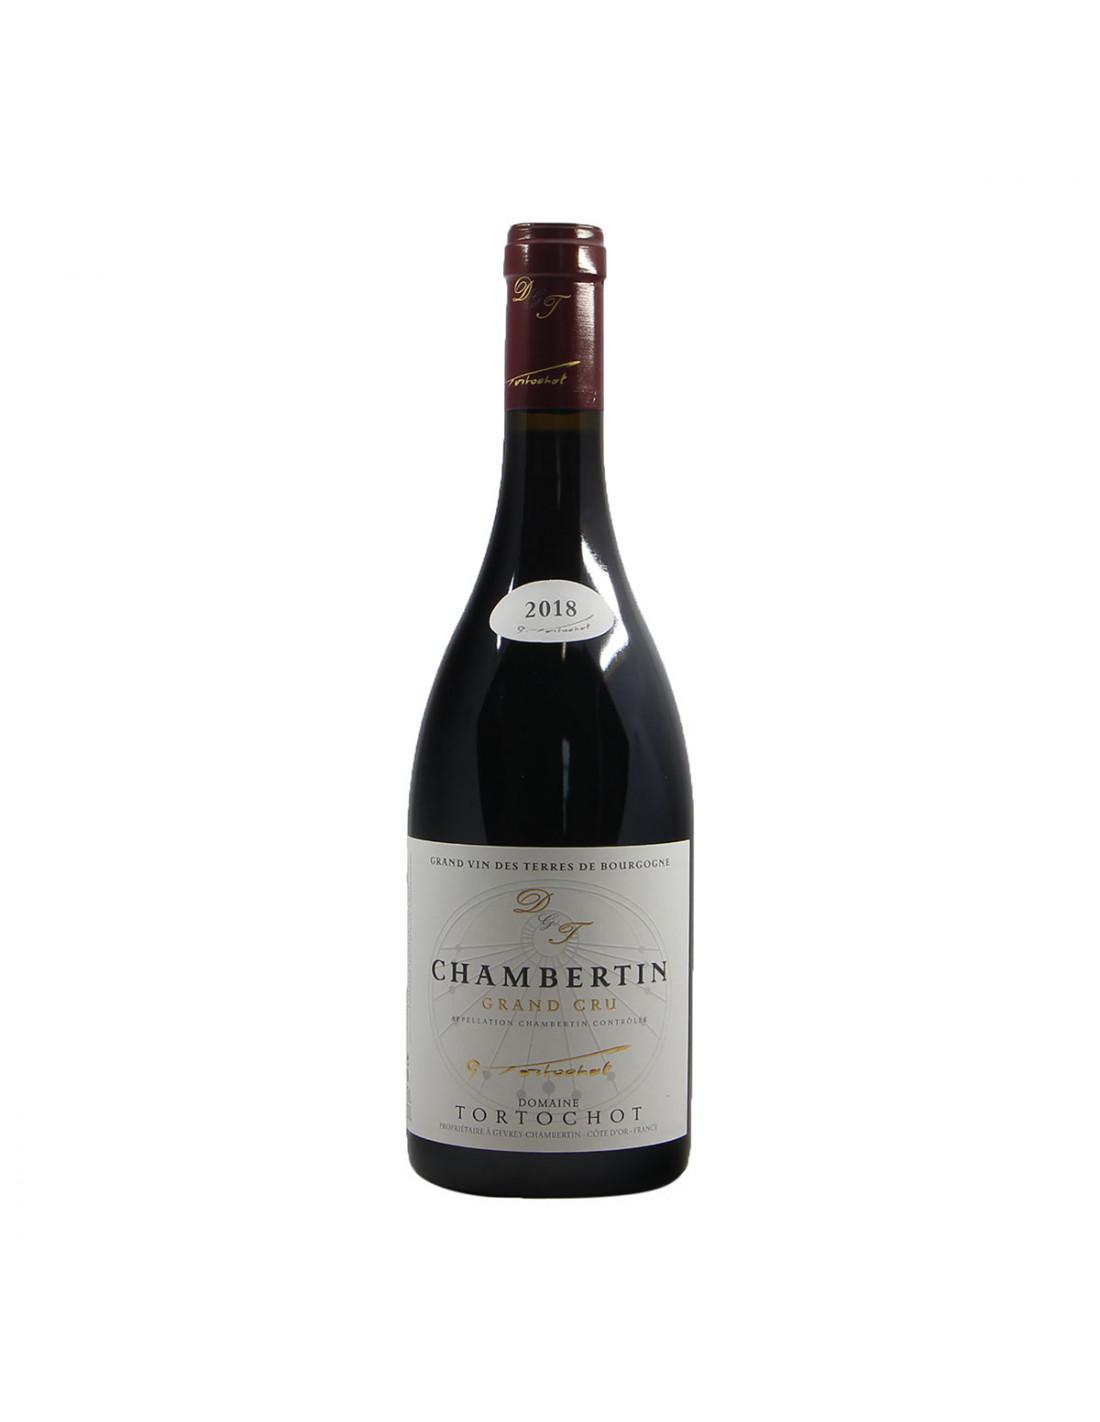 CHAMBERTIN GRAND CRU 2018 TORTOCHOT Grandi Bottiglie